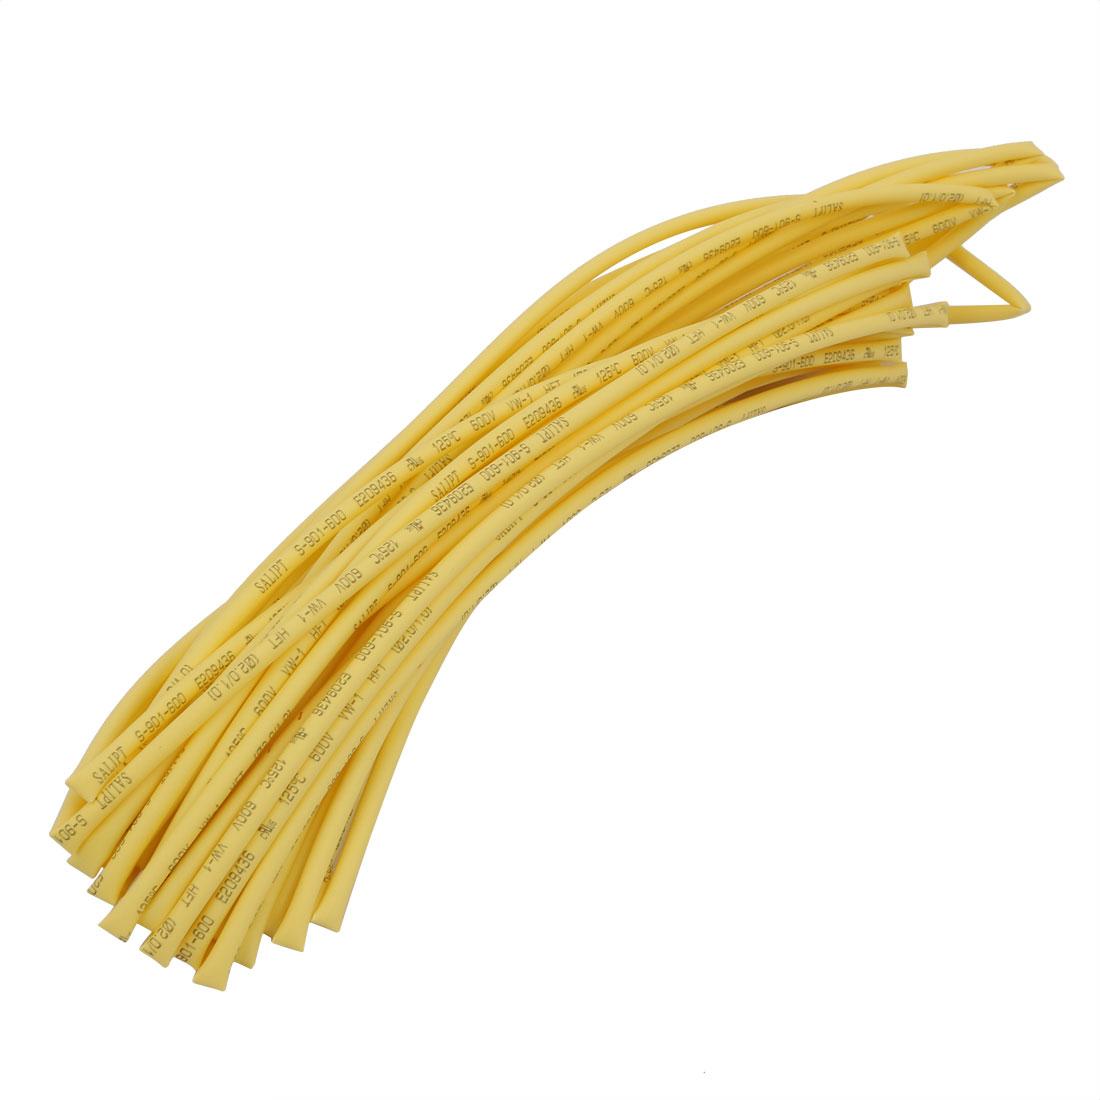 8M 0.08in Inner Dia Polyolefin Flame Retardant Tube Yellow for Wire Repairing